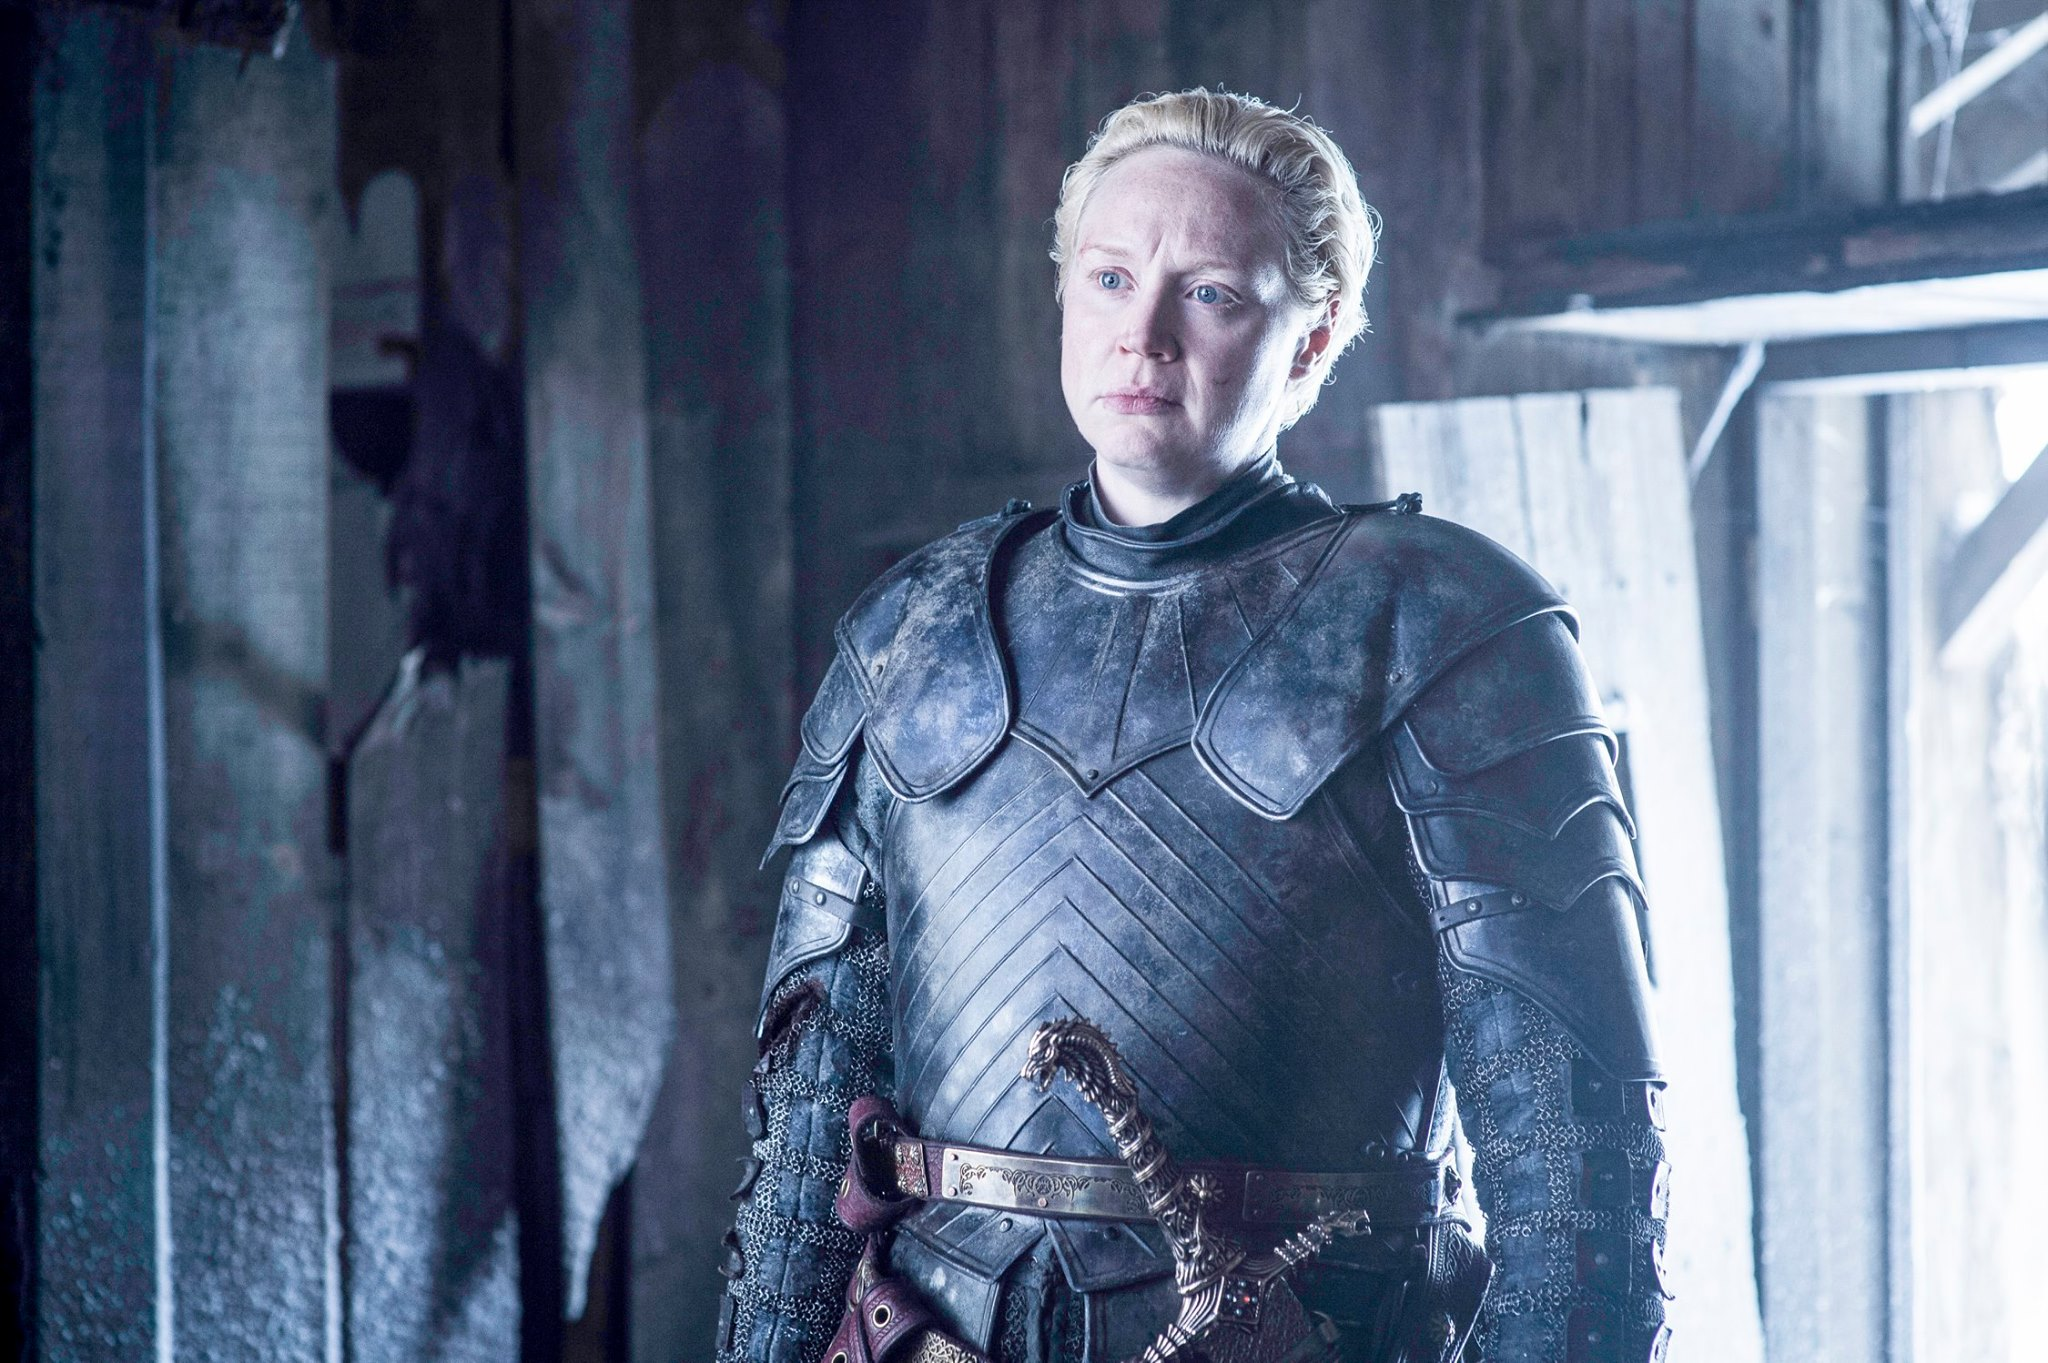 Gwendoline Christie as Brienne of Tarth Game of Thrones